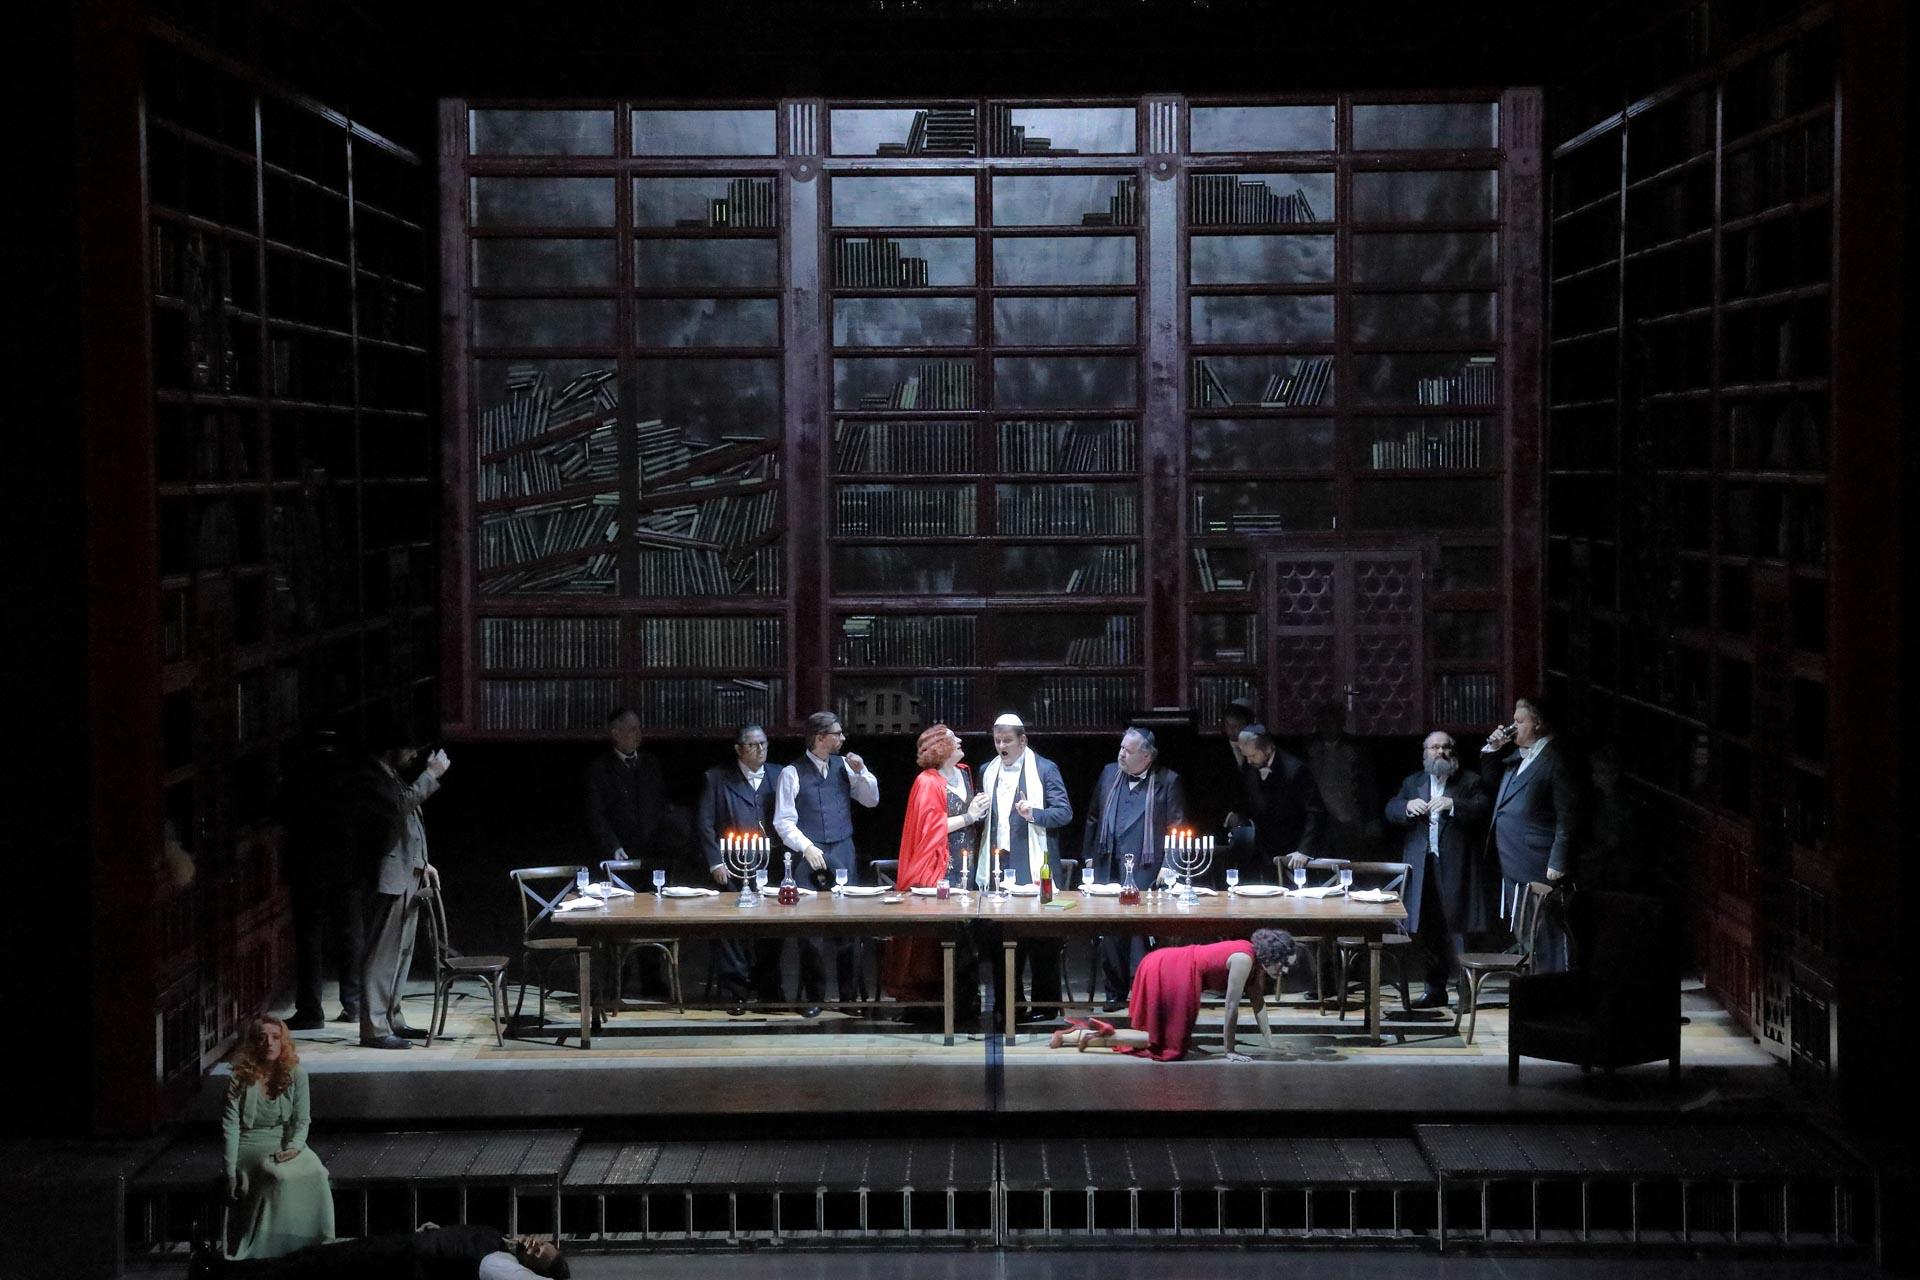 Bayerische Staatsoper Munich - Salome - Warlikowski production (© Wilfried Hösl)